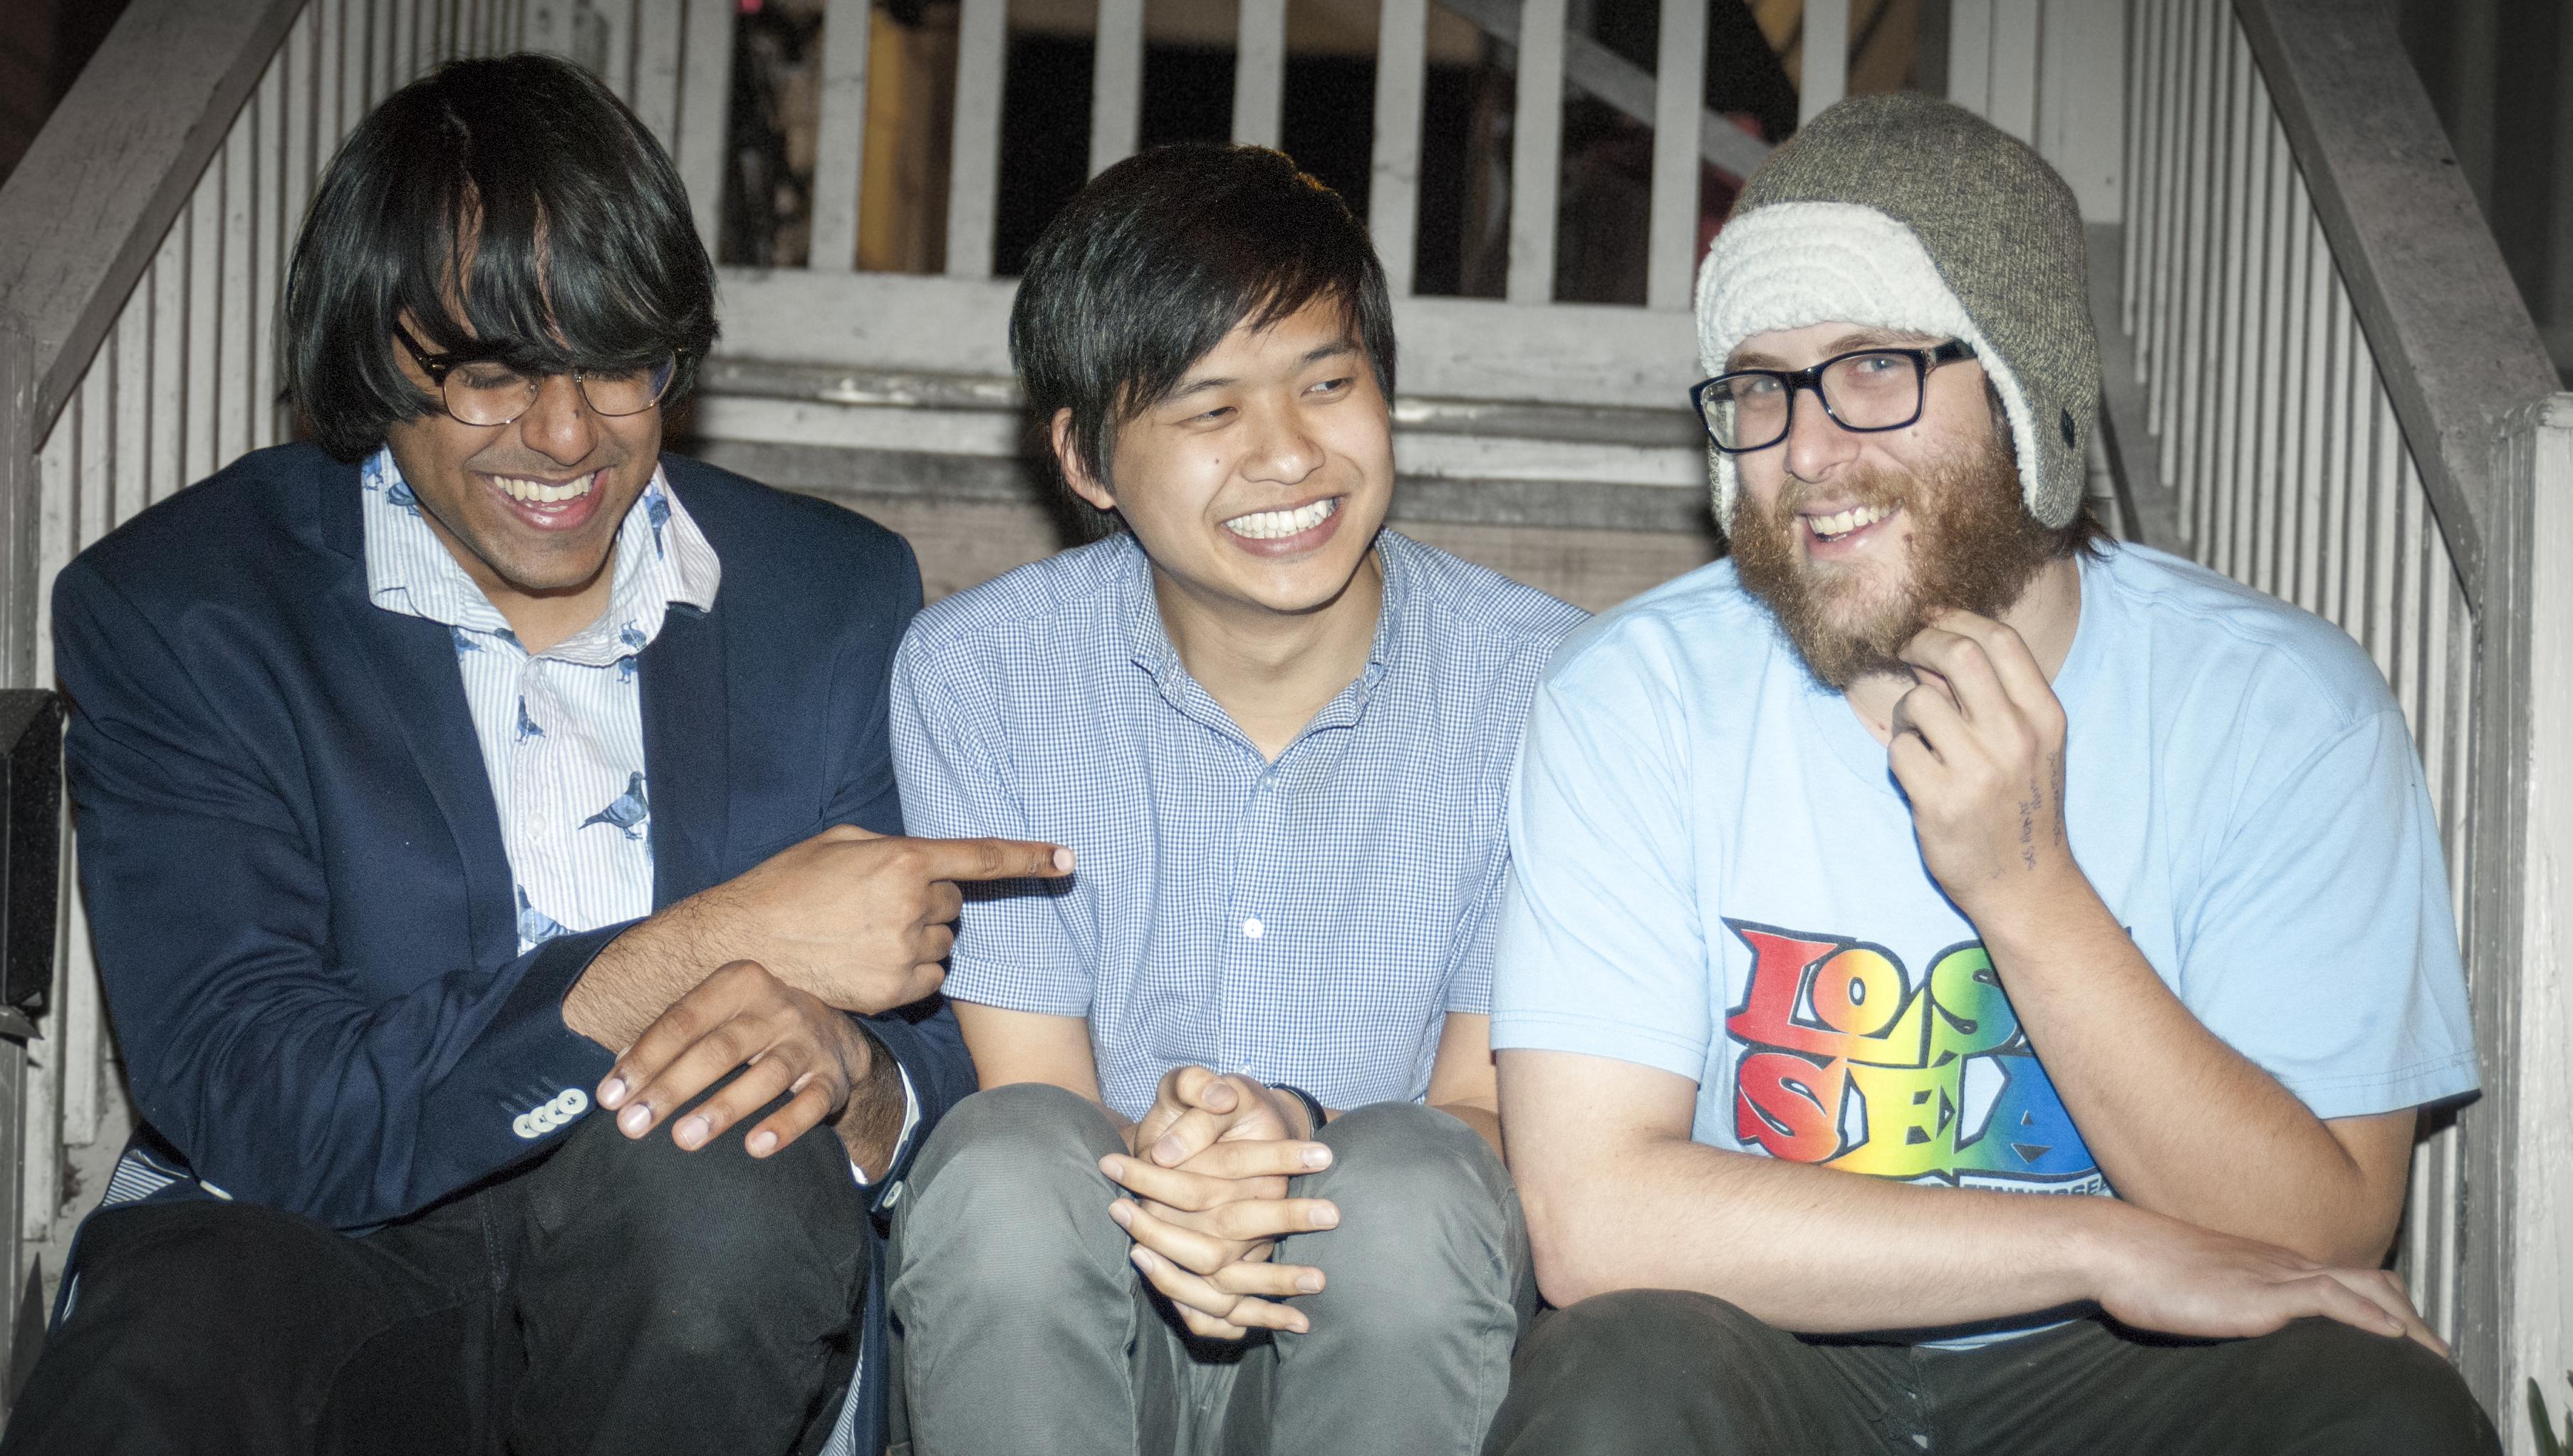 Pillage & Plunder and Gokul Parasuram Hsiang-Ming Wen Noah Kess the show must go wrong baby robot media